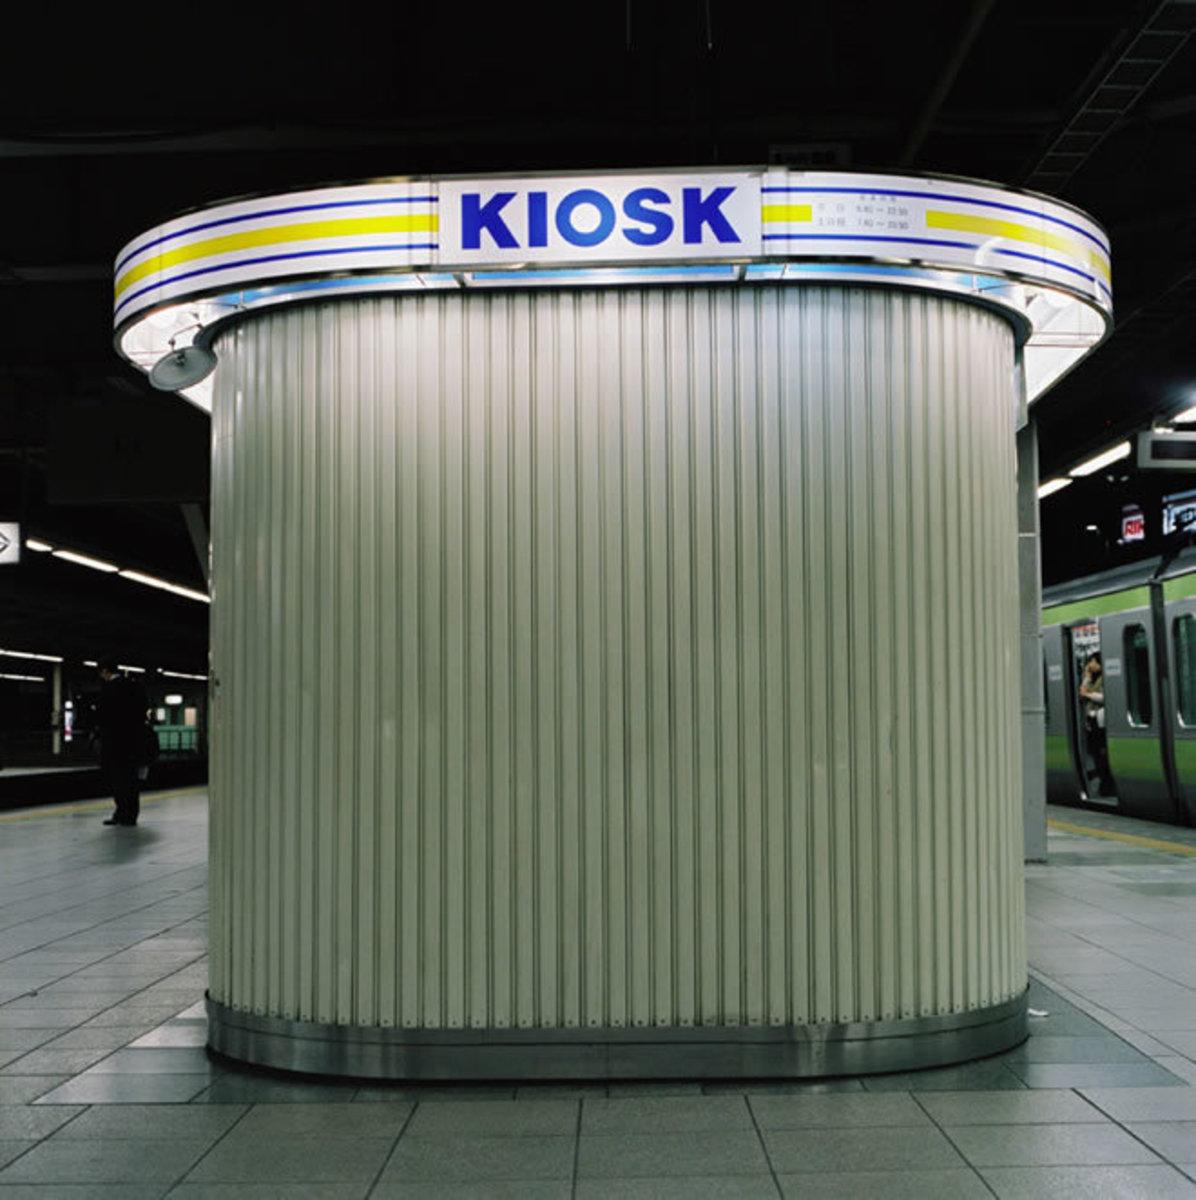 After Hours Kiosk, Shinagawa Station, Tokyo, 2005